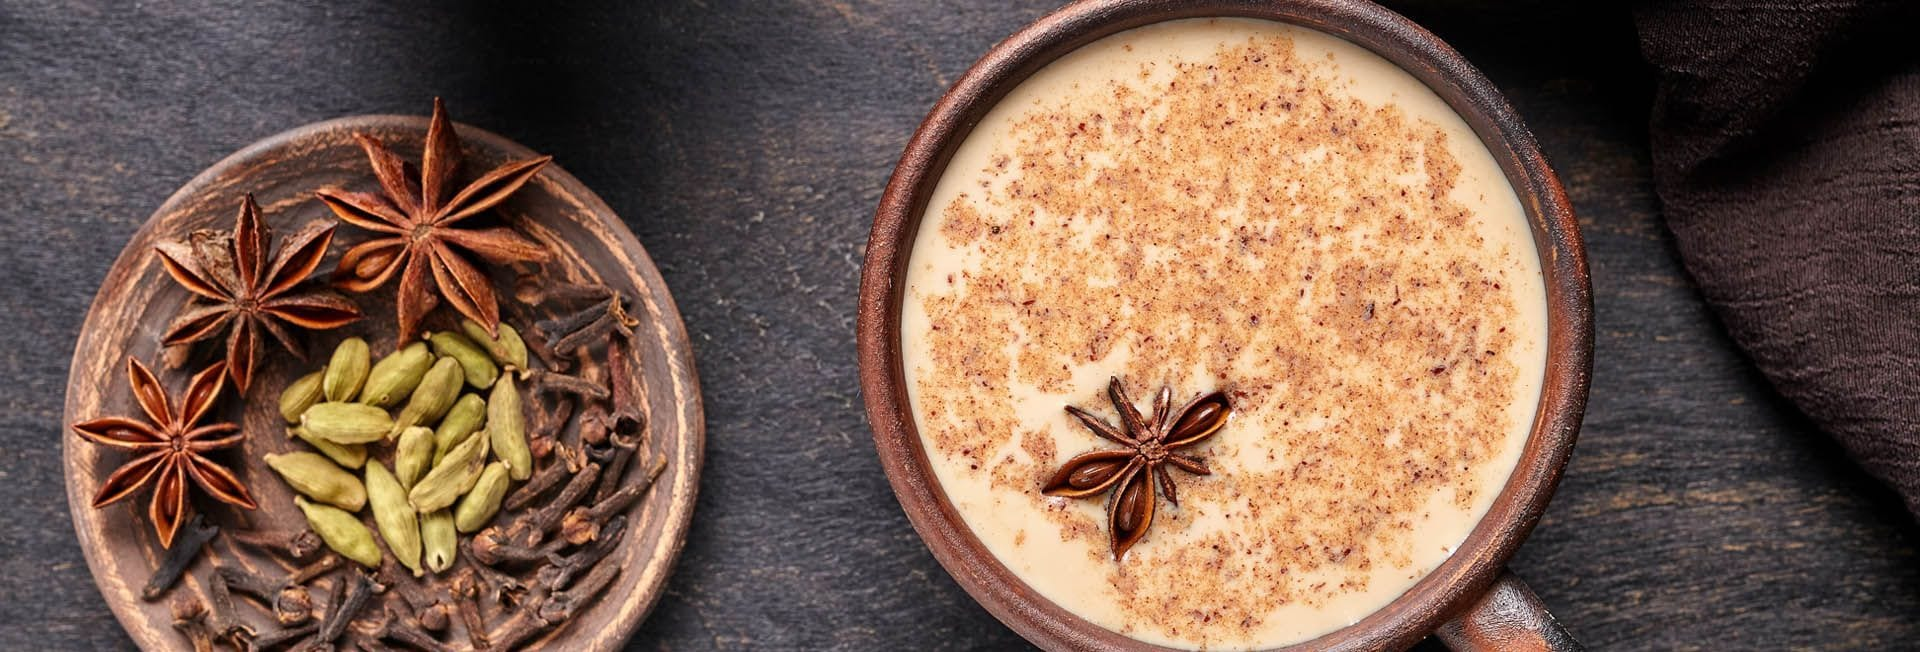 Chai latte con bebida de arroz con calcio bio